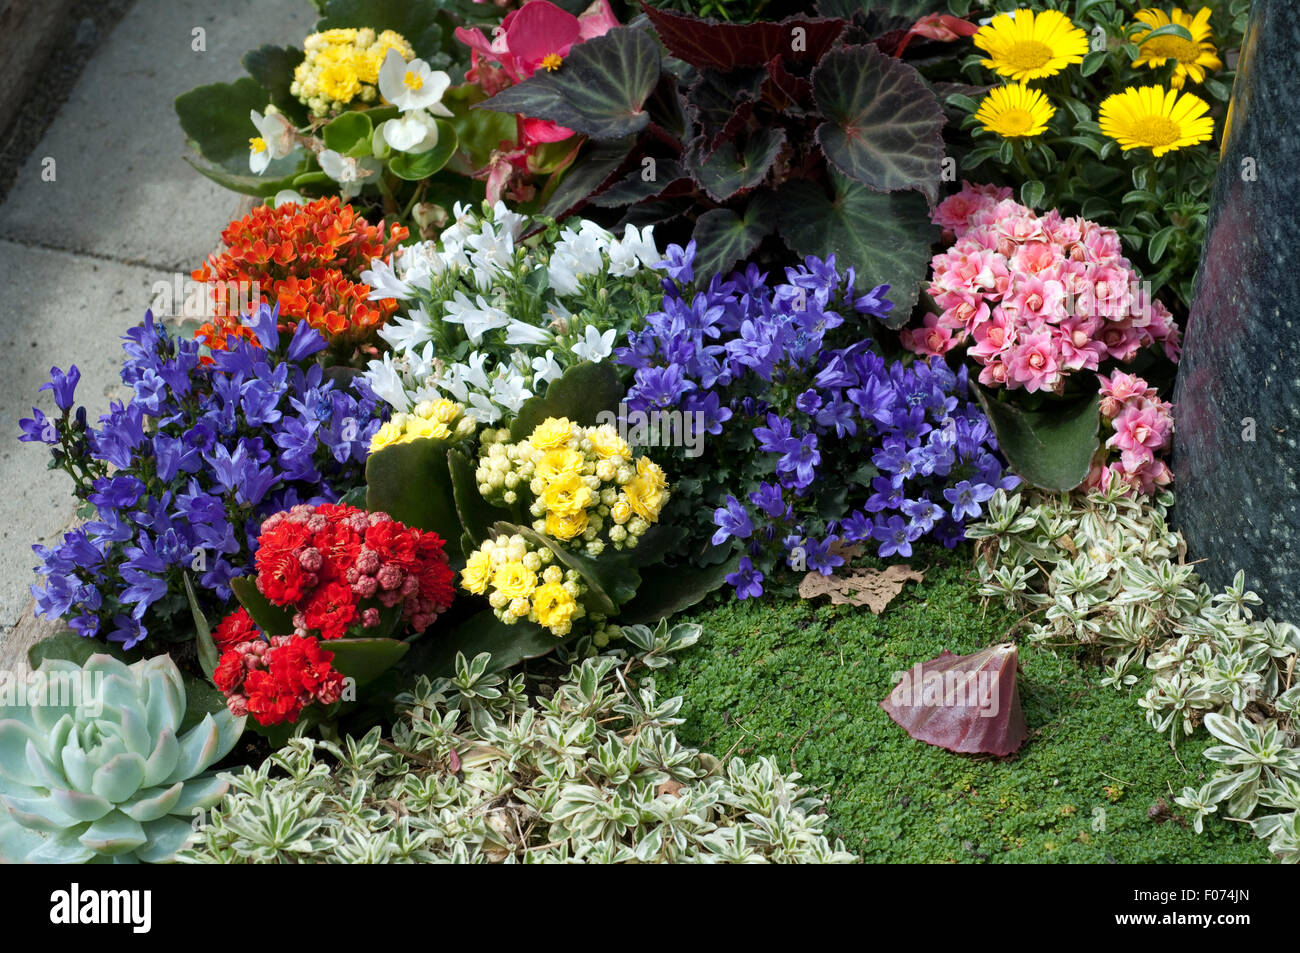 grabbepflanzung randbepflanzung blumen stockfoto bild 86209165 alamy. Black Bedroom Furniture Sets. Home Design Ideas